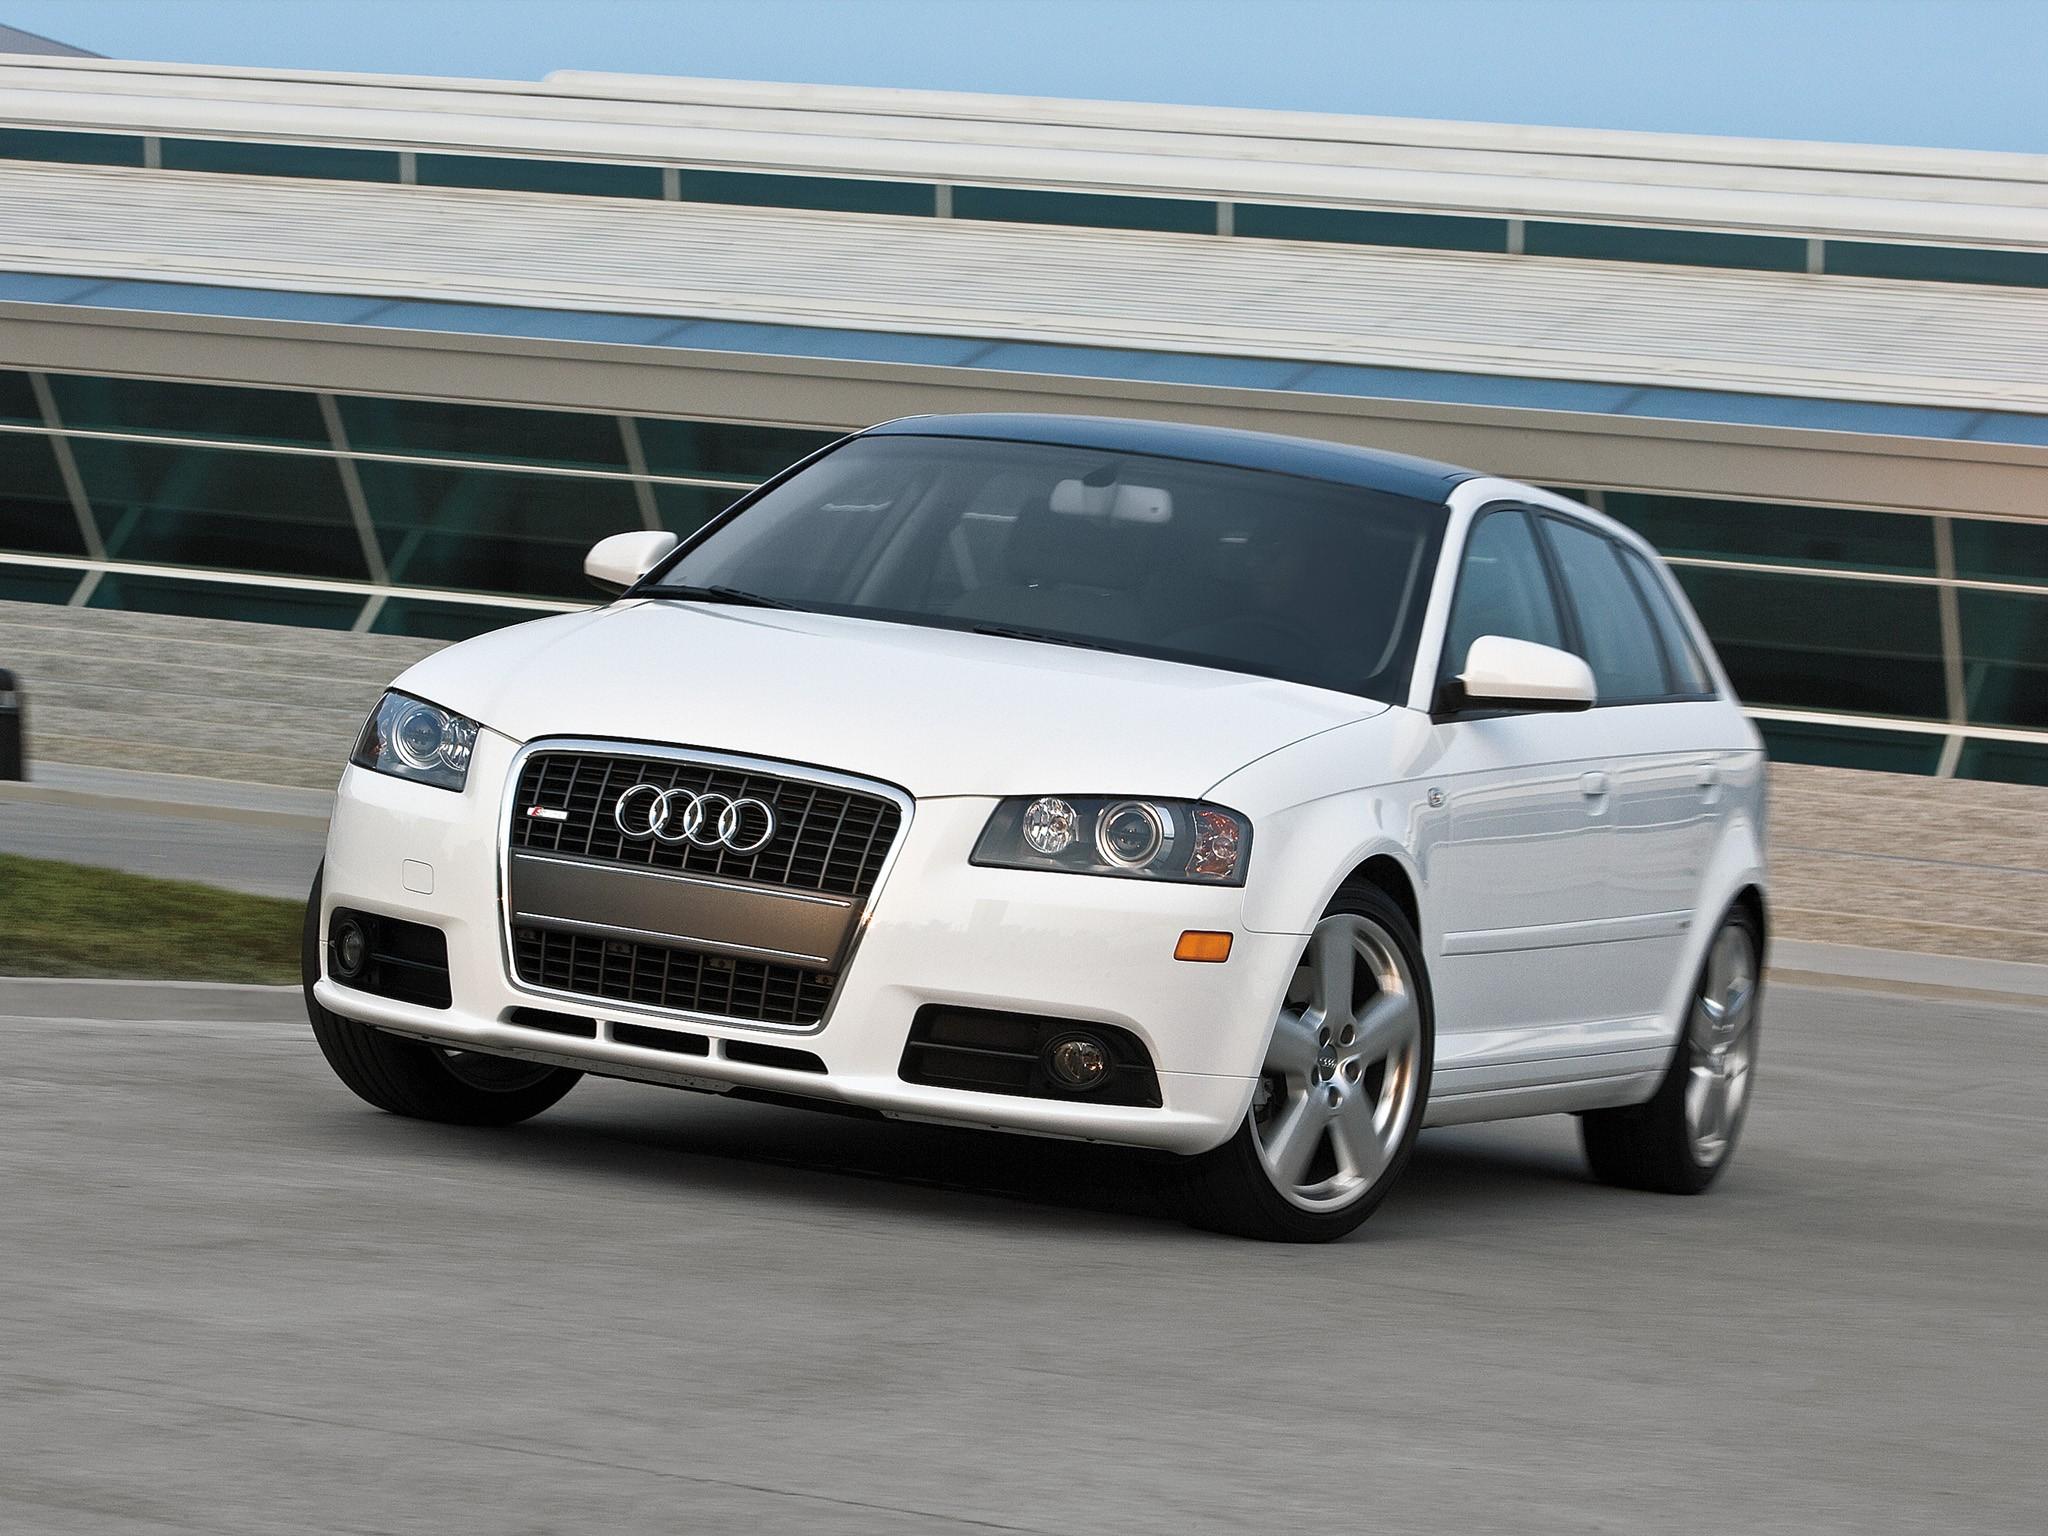 Audi A3 2008 >> AUDI A3 Sportback - 2004, 2005, 2006, 2007, 2008 - autoevolution